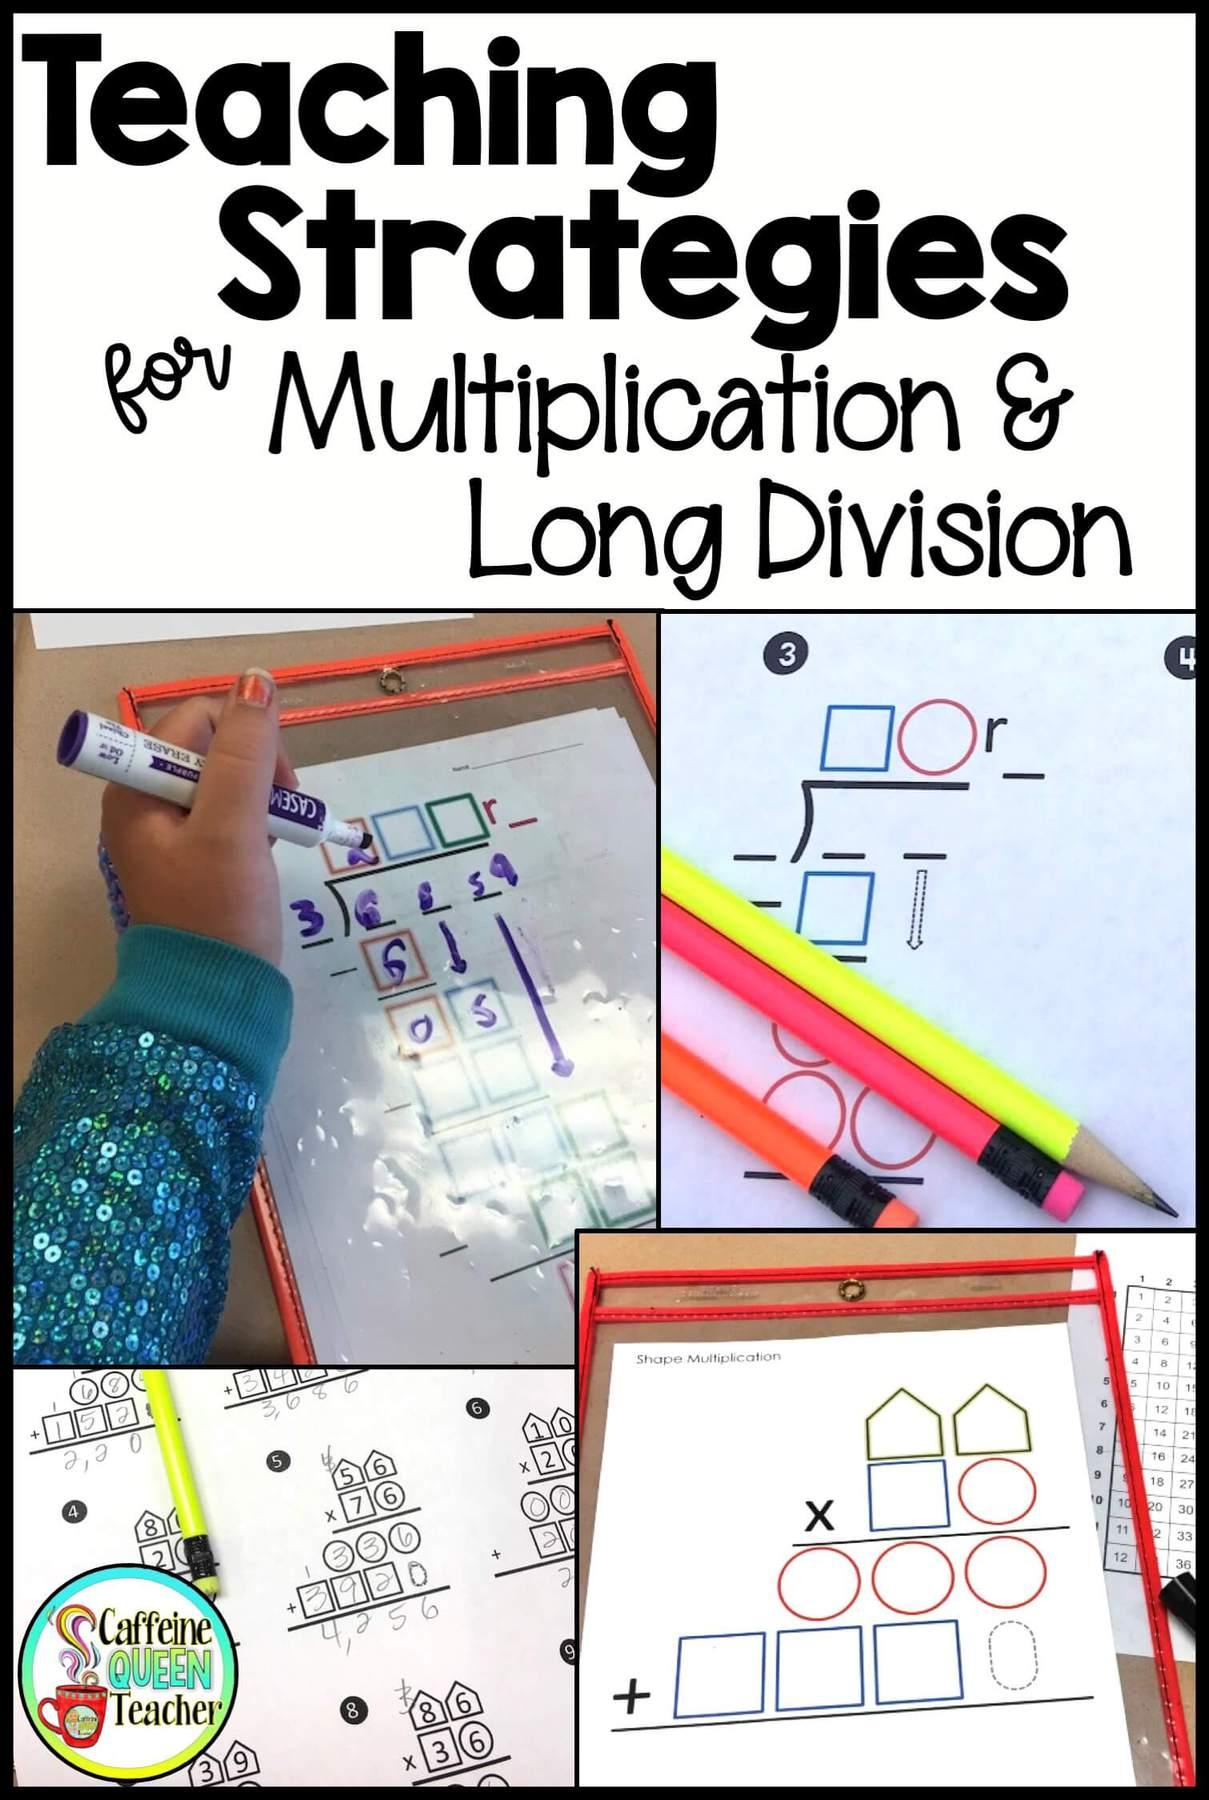 How to Teach Multi-Digit Multiplication and Long Division - Caffeine Queen  Teacher [ 1800 x 1209 Pixel ]